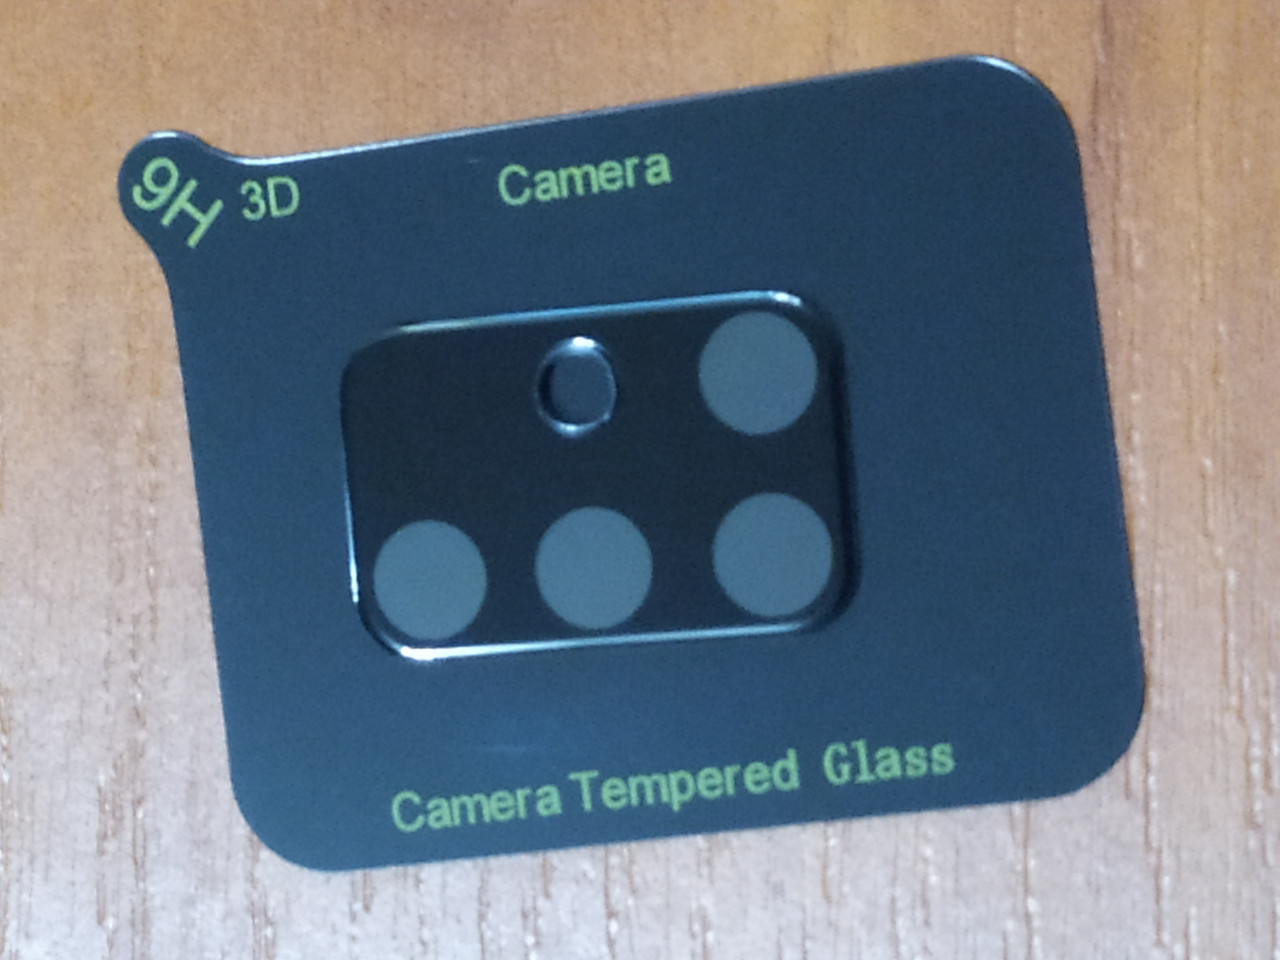 Скло на камеру Camera Tempered Glass 3D / 9H Samsung A51 2020 (чорне)